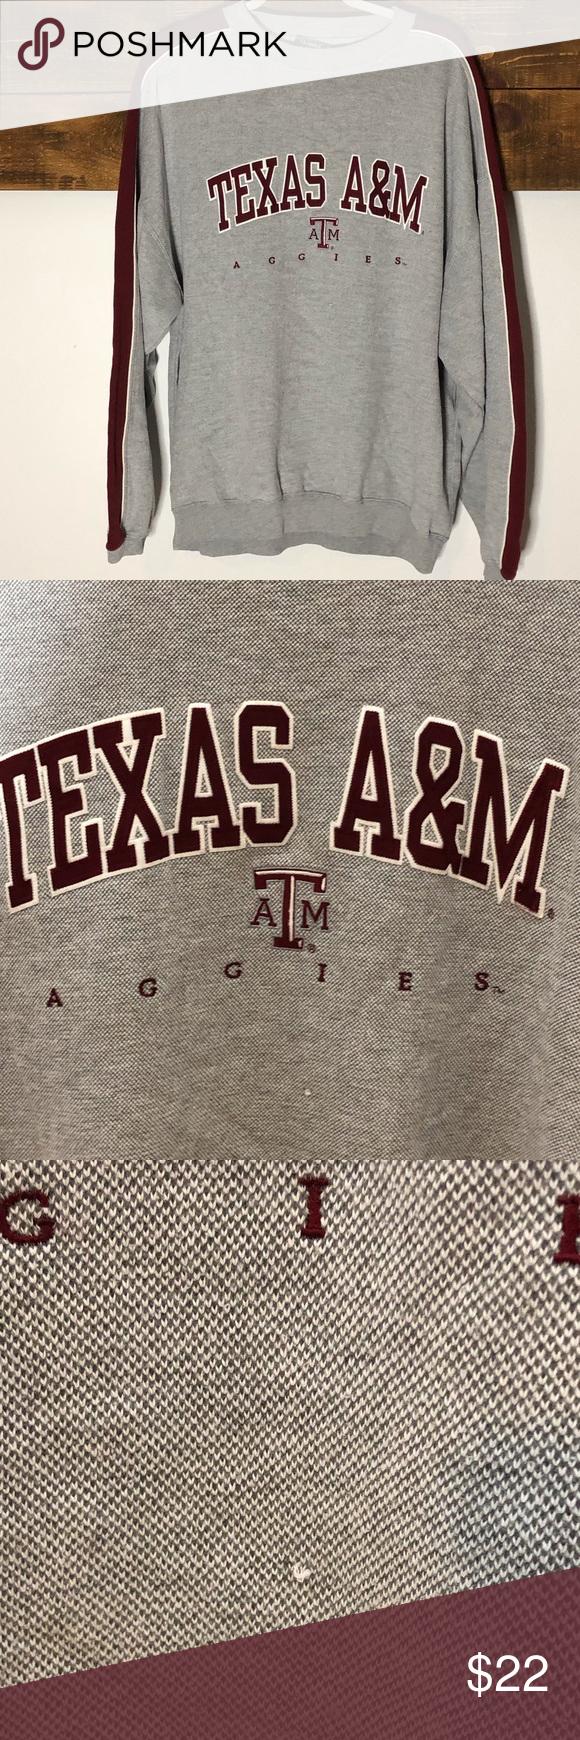 Texas A M Sweatshirt Sweatshirts Sweatshirt Shirt Sweatshirts Hoodie [ 1740 x 580 Pixel ]